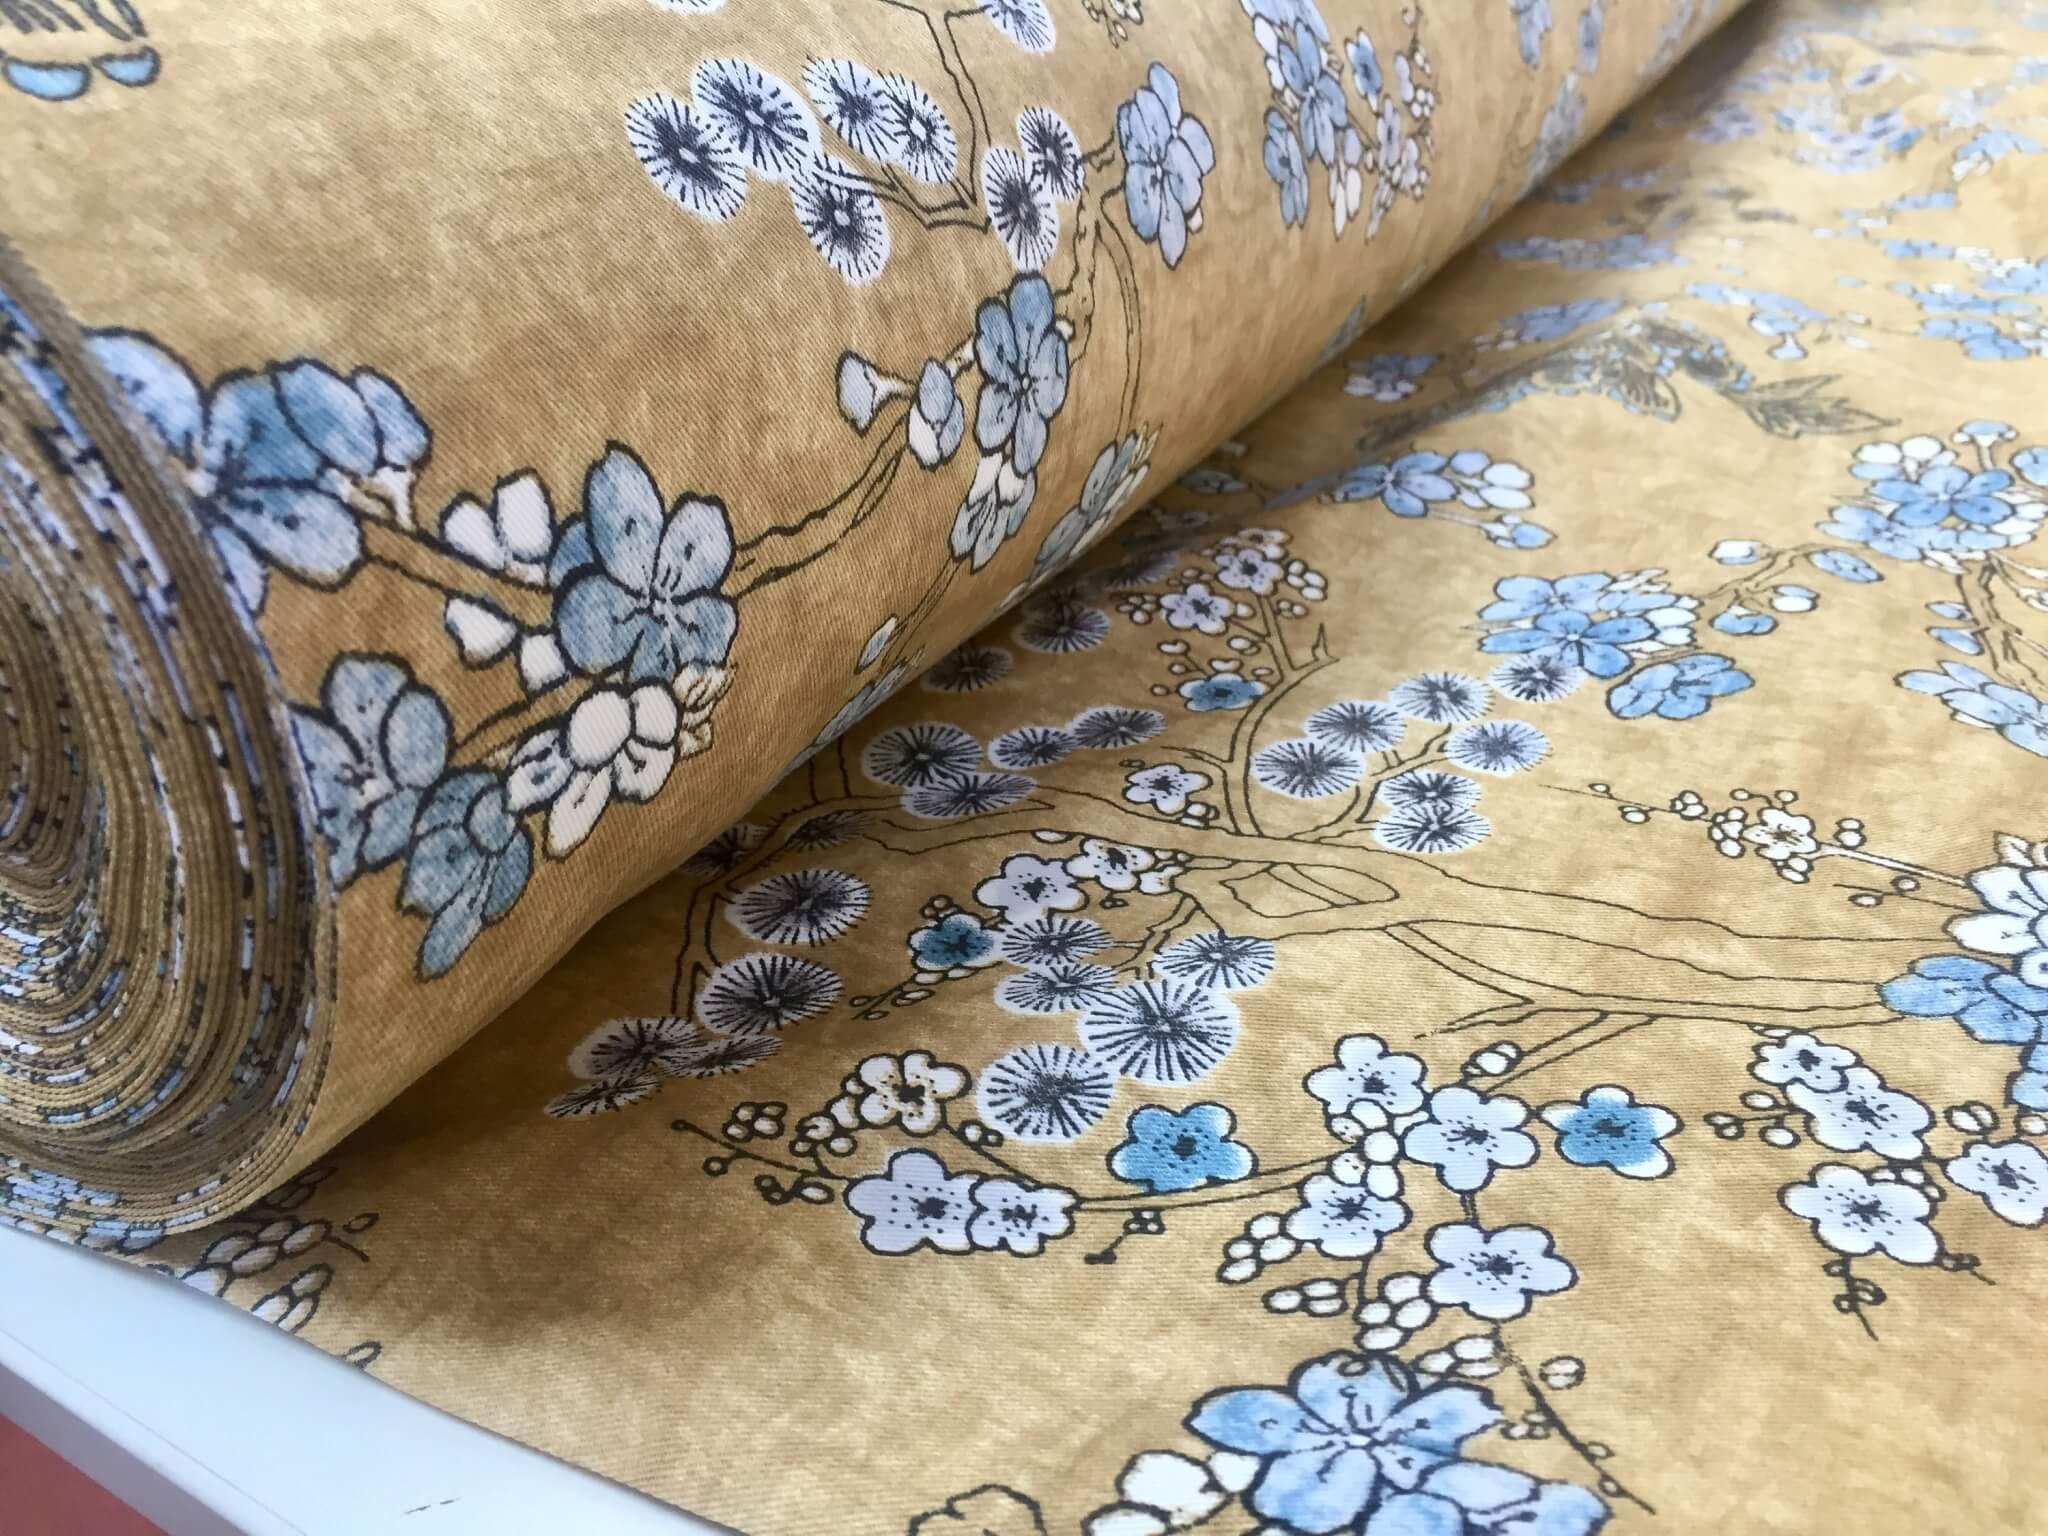 japanese-sakura-blossom-cherry-floral-twill-curtain-fabric-oriental-furnishing-material-55-wide-textile-mustard-blue-5c1fce0e1.jpg